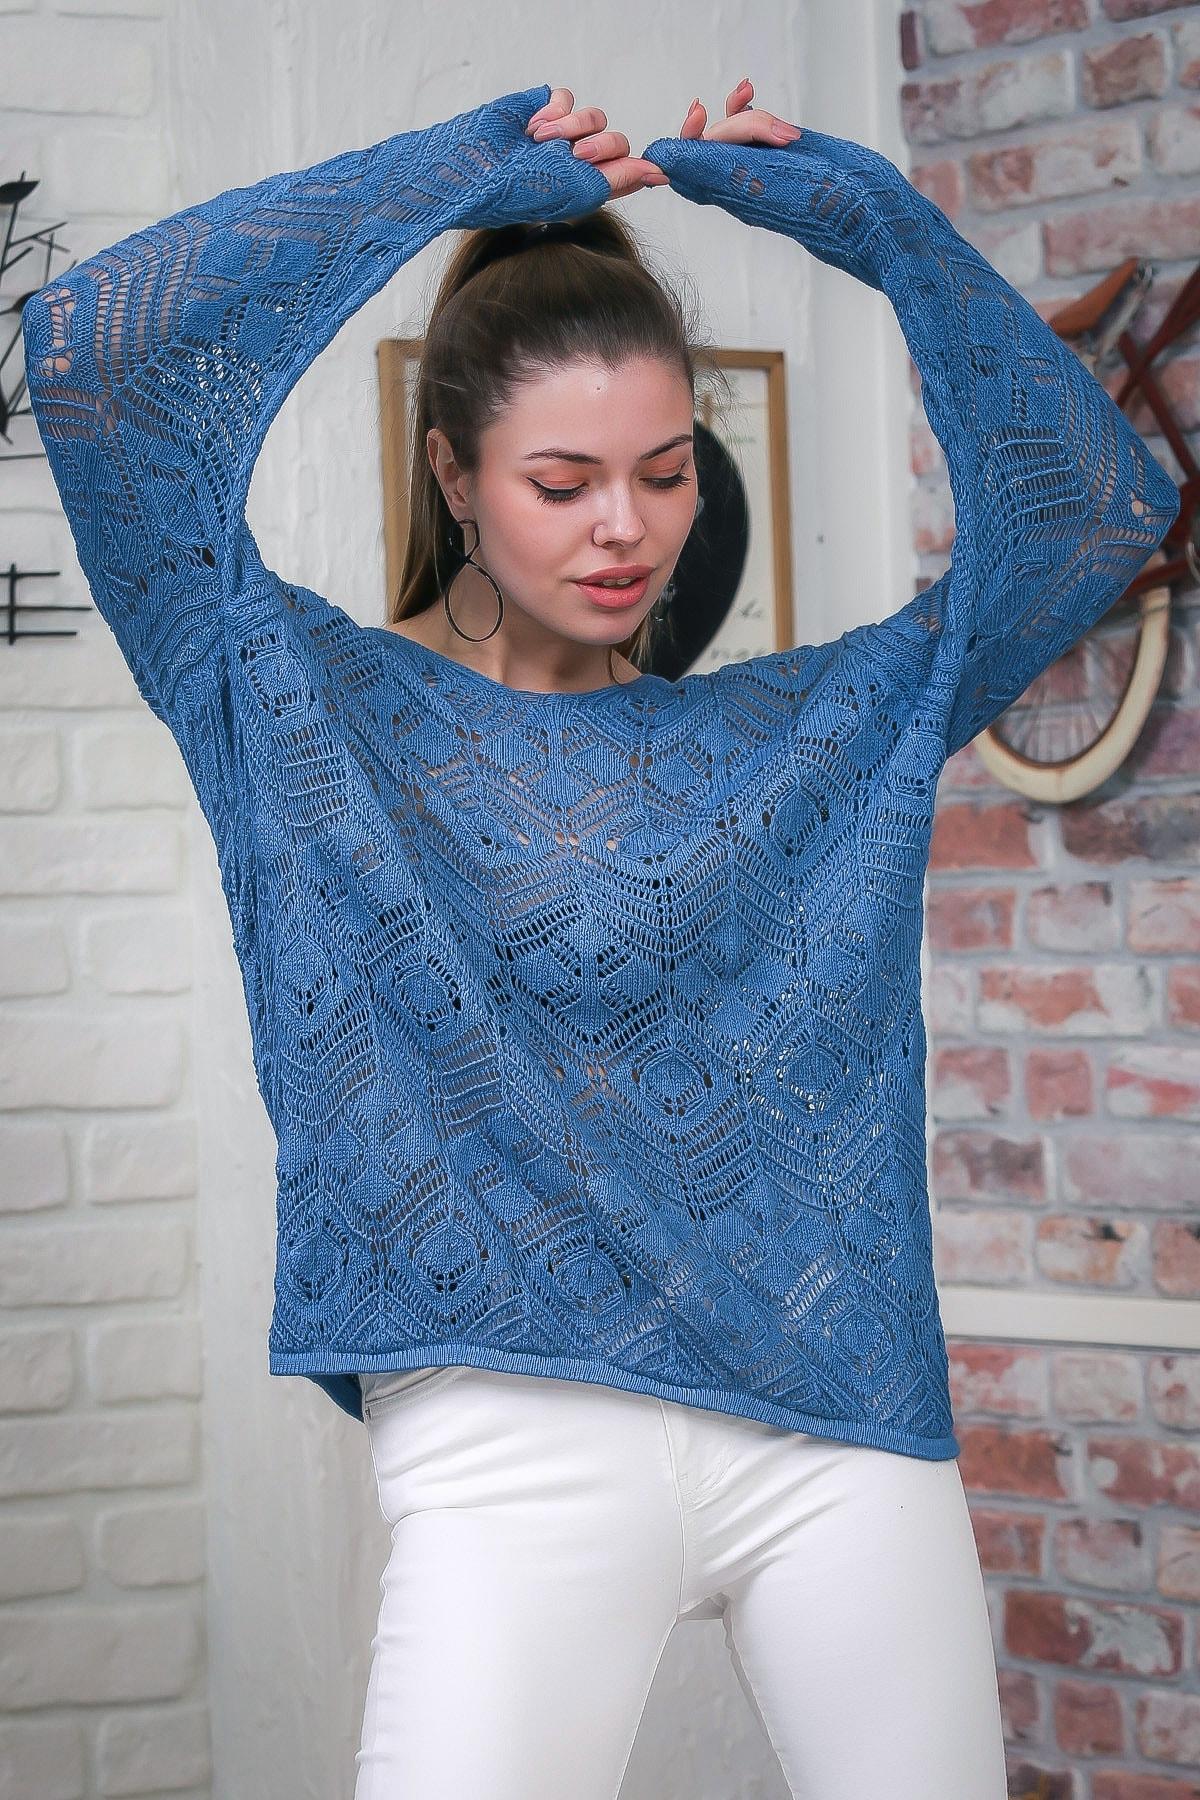 Chiccy Kadın Mavi V Yaka Ajurlu Salaş Triko Bluz M10010200BL95553 3